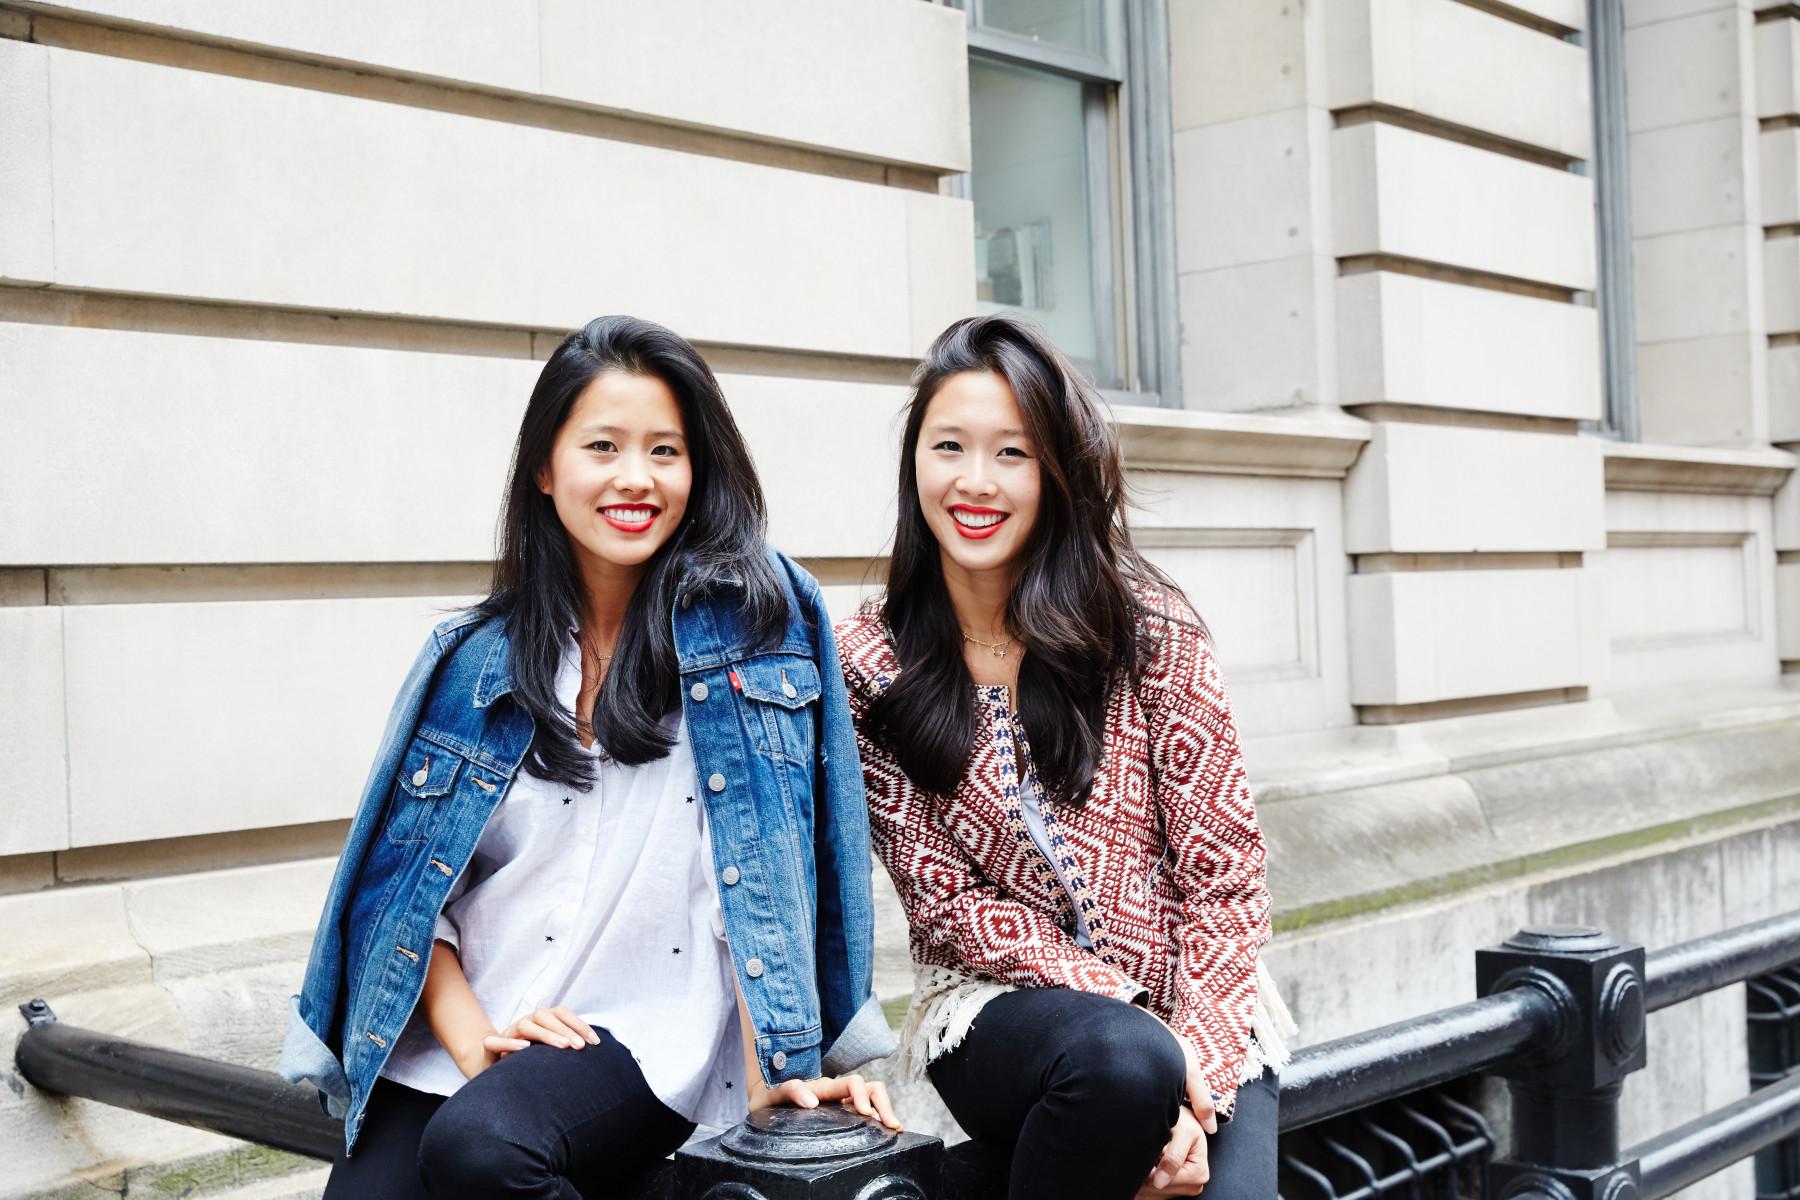 Hannah + Marian Cheng (Credit Nicole Franzen)